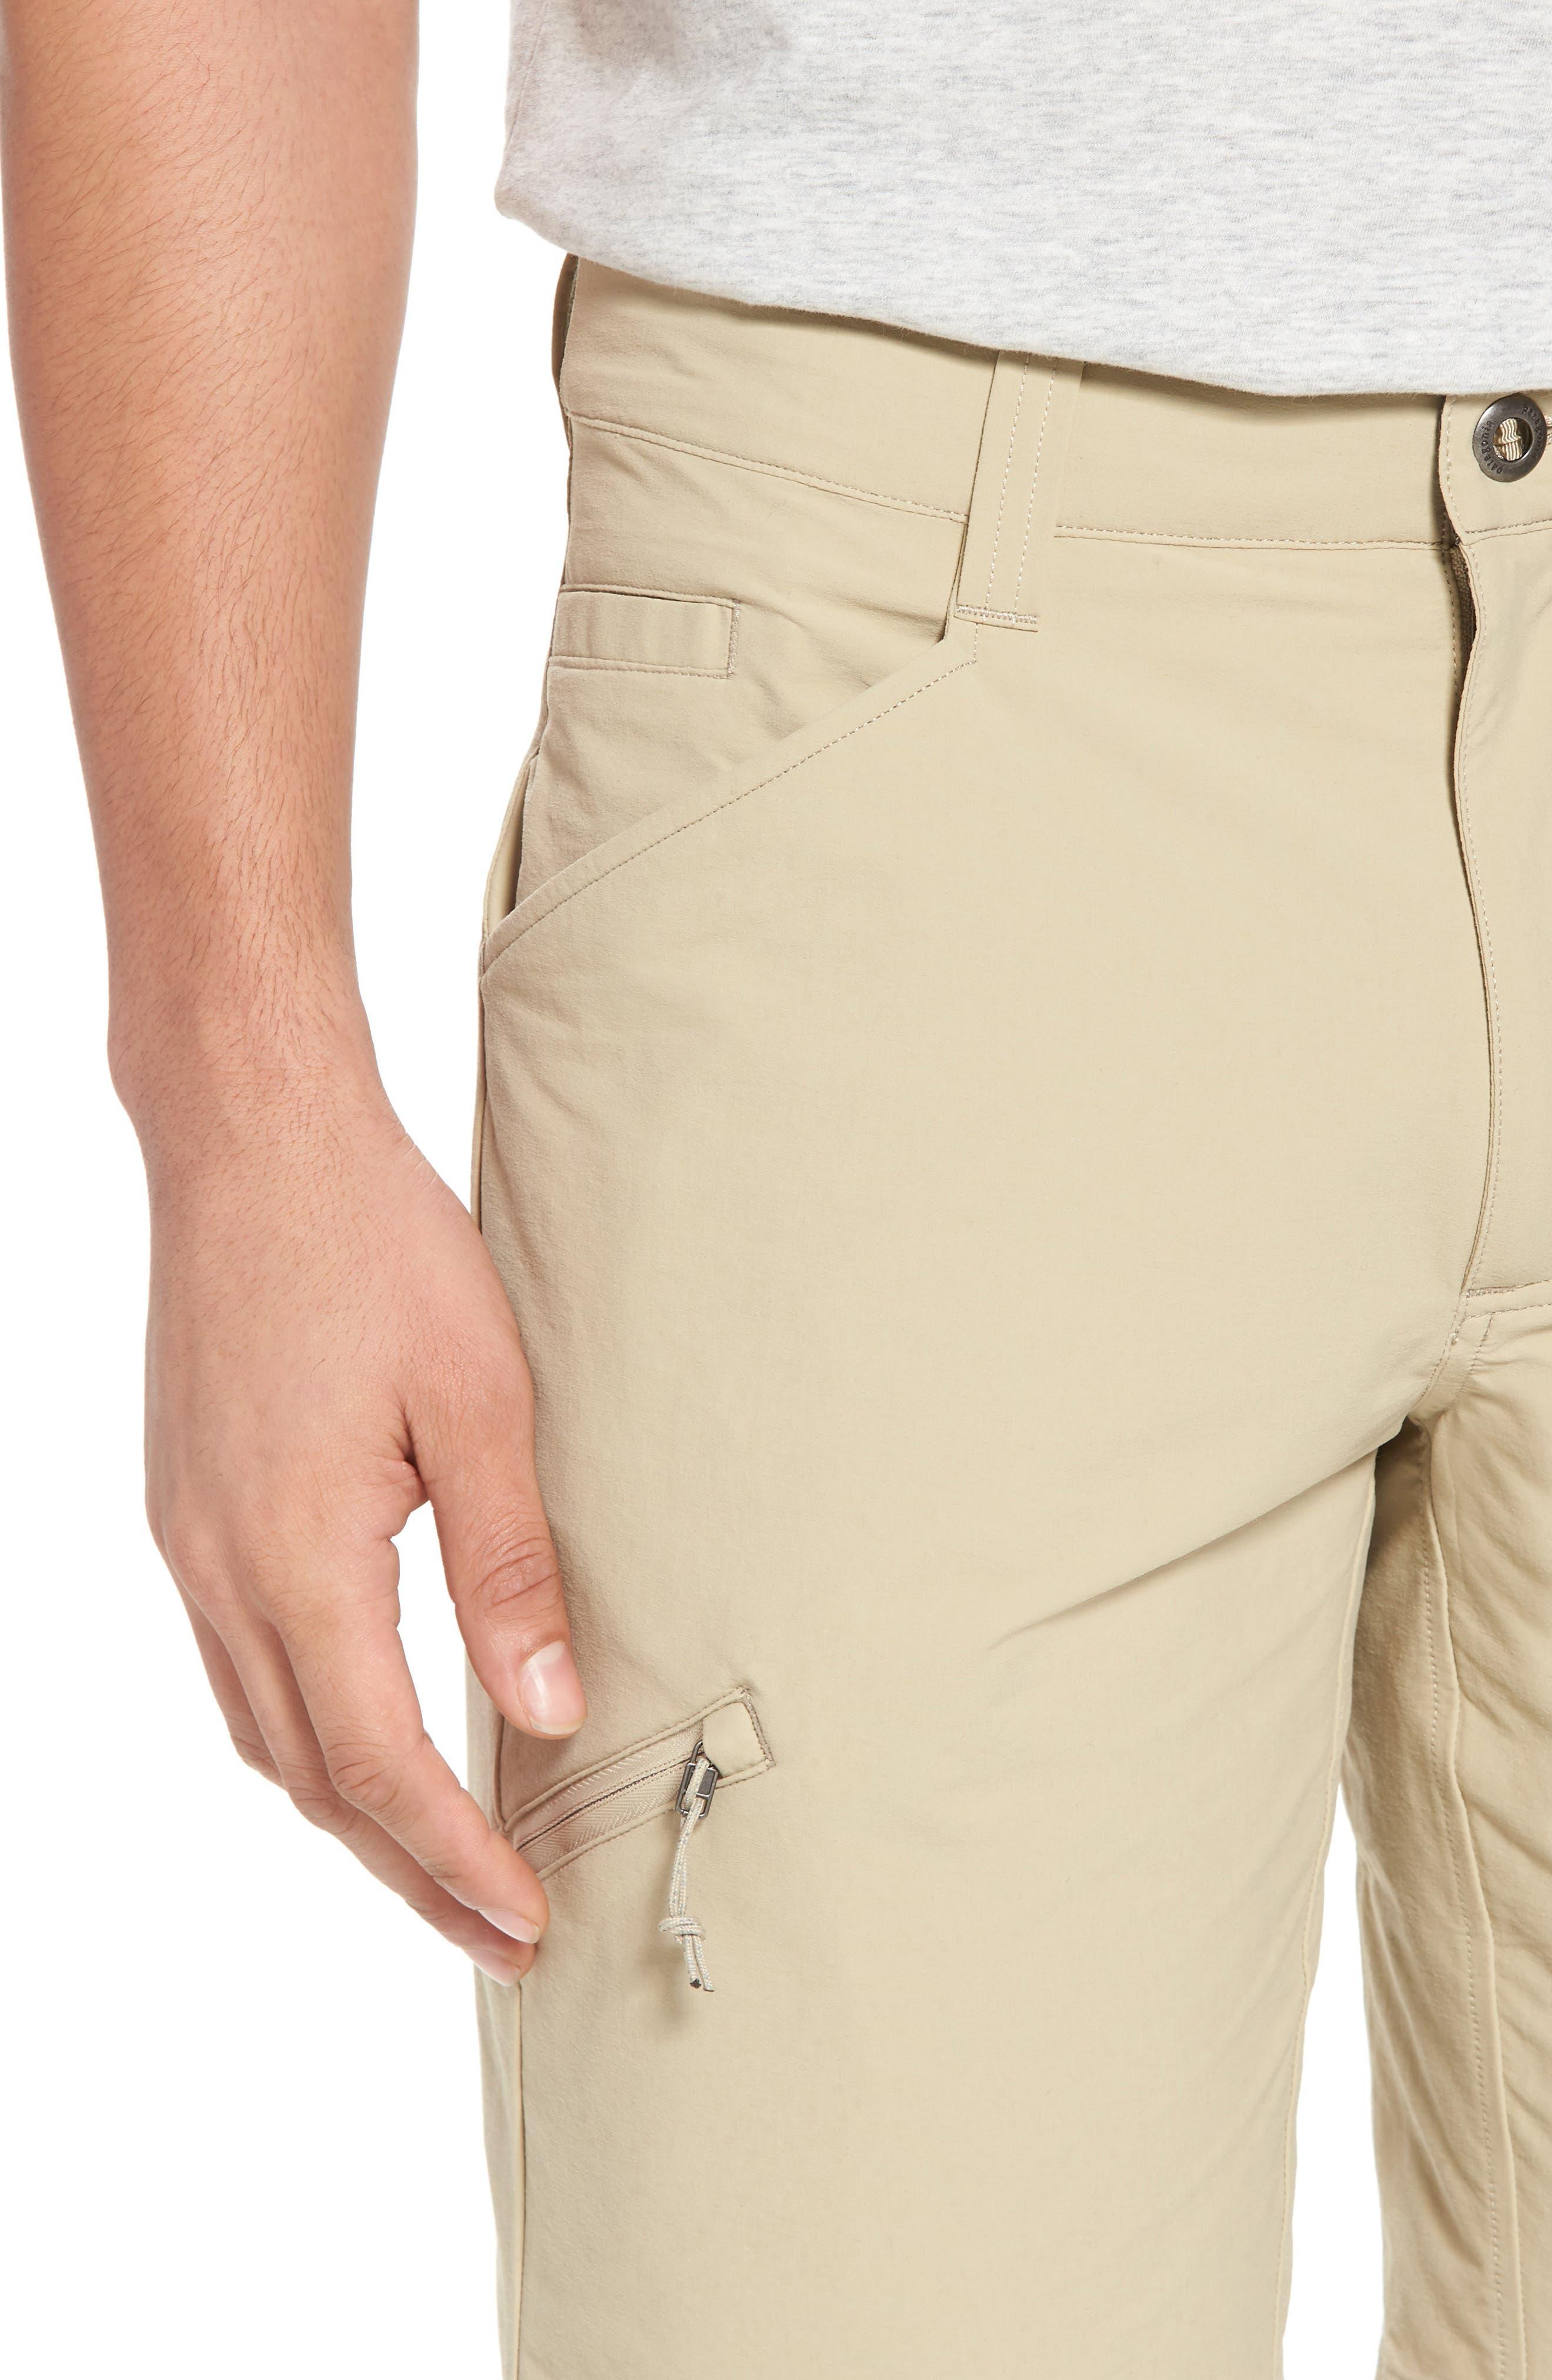 Quandary Shorts,                             Alternate thumbnail 4, color,                             EL CAP KHAKI